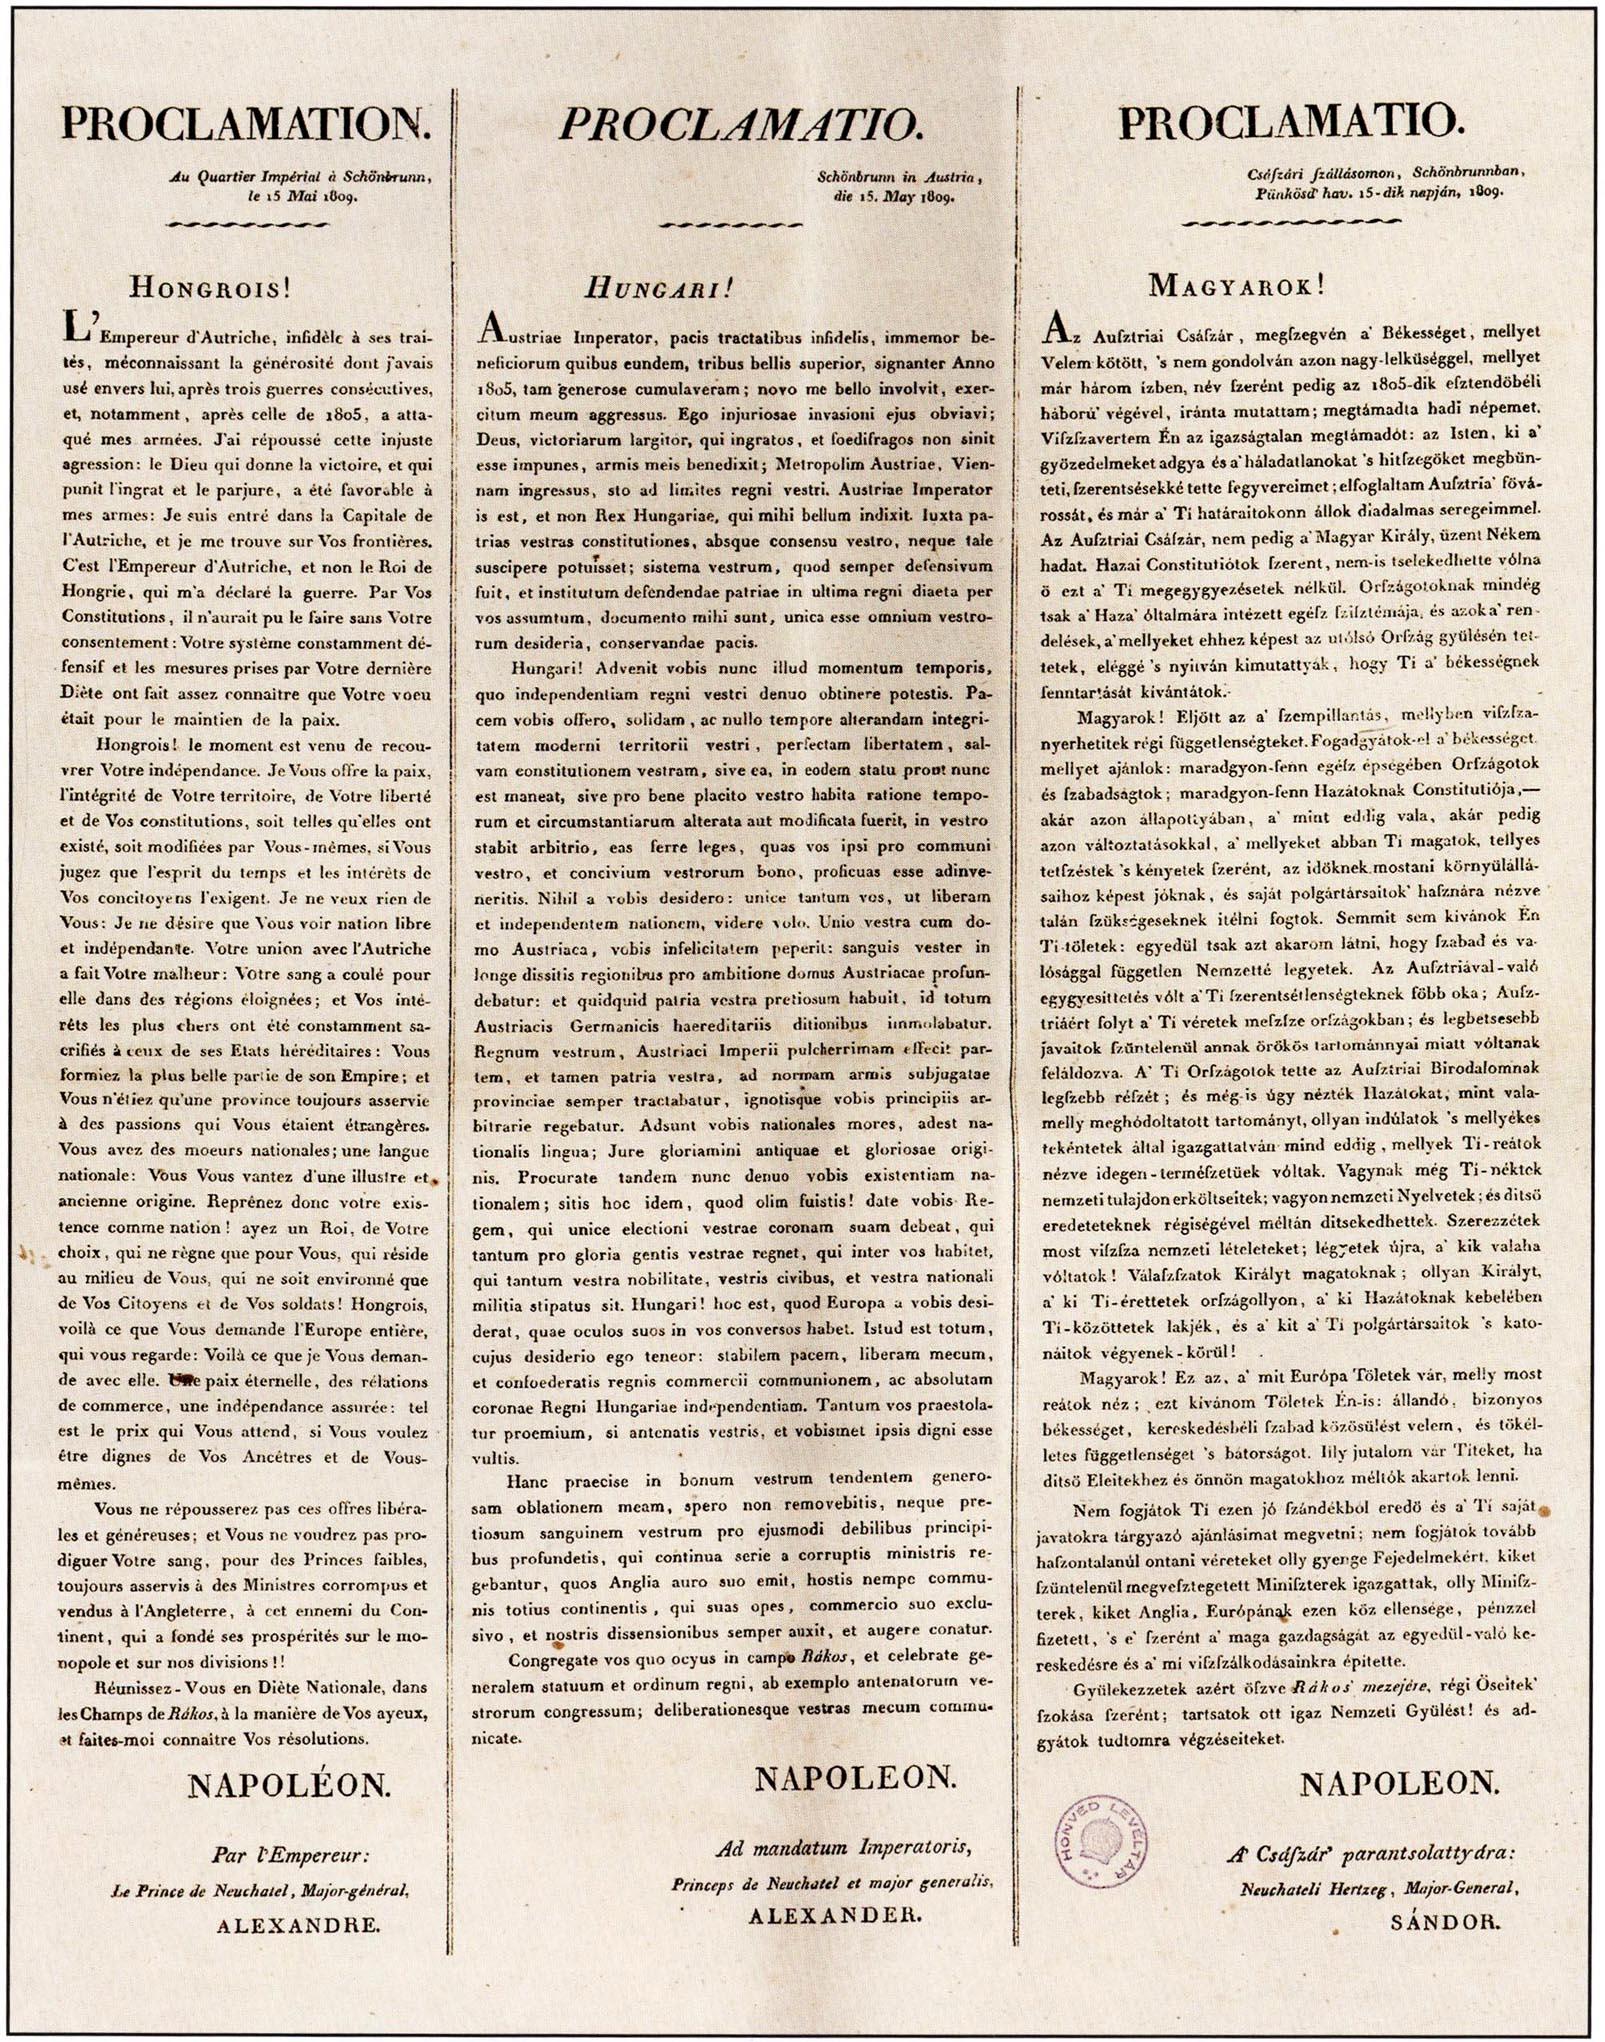 Filenapleon kiltvnya a magyar nemzethez 1809g wikimedia commons filenapleon kiltvnya a magyar nemzethez 1809g stopboris Images